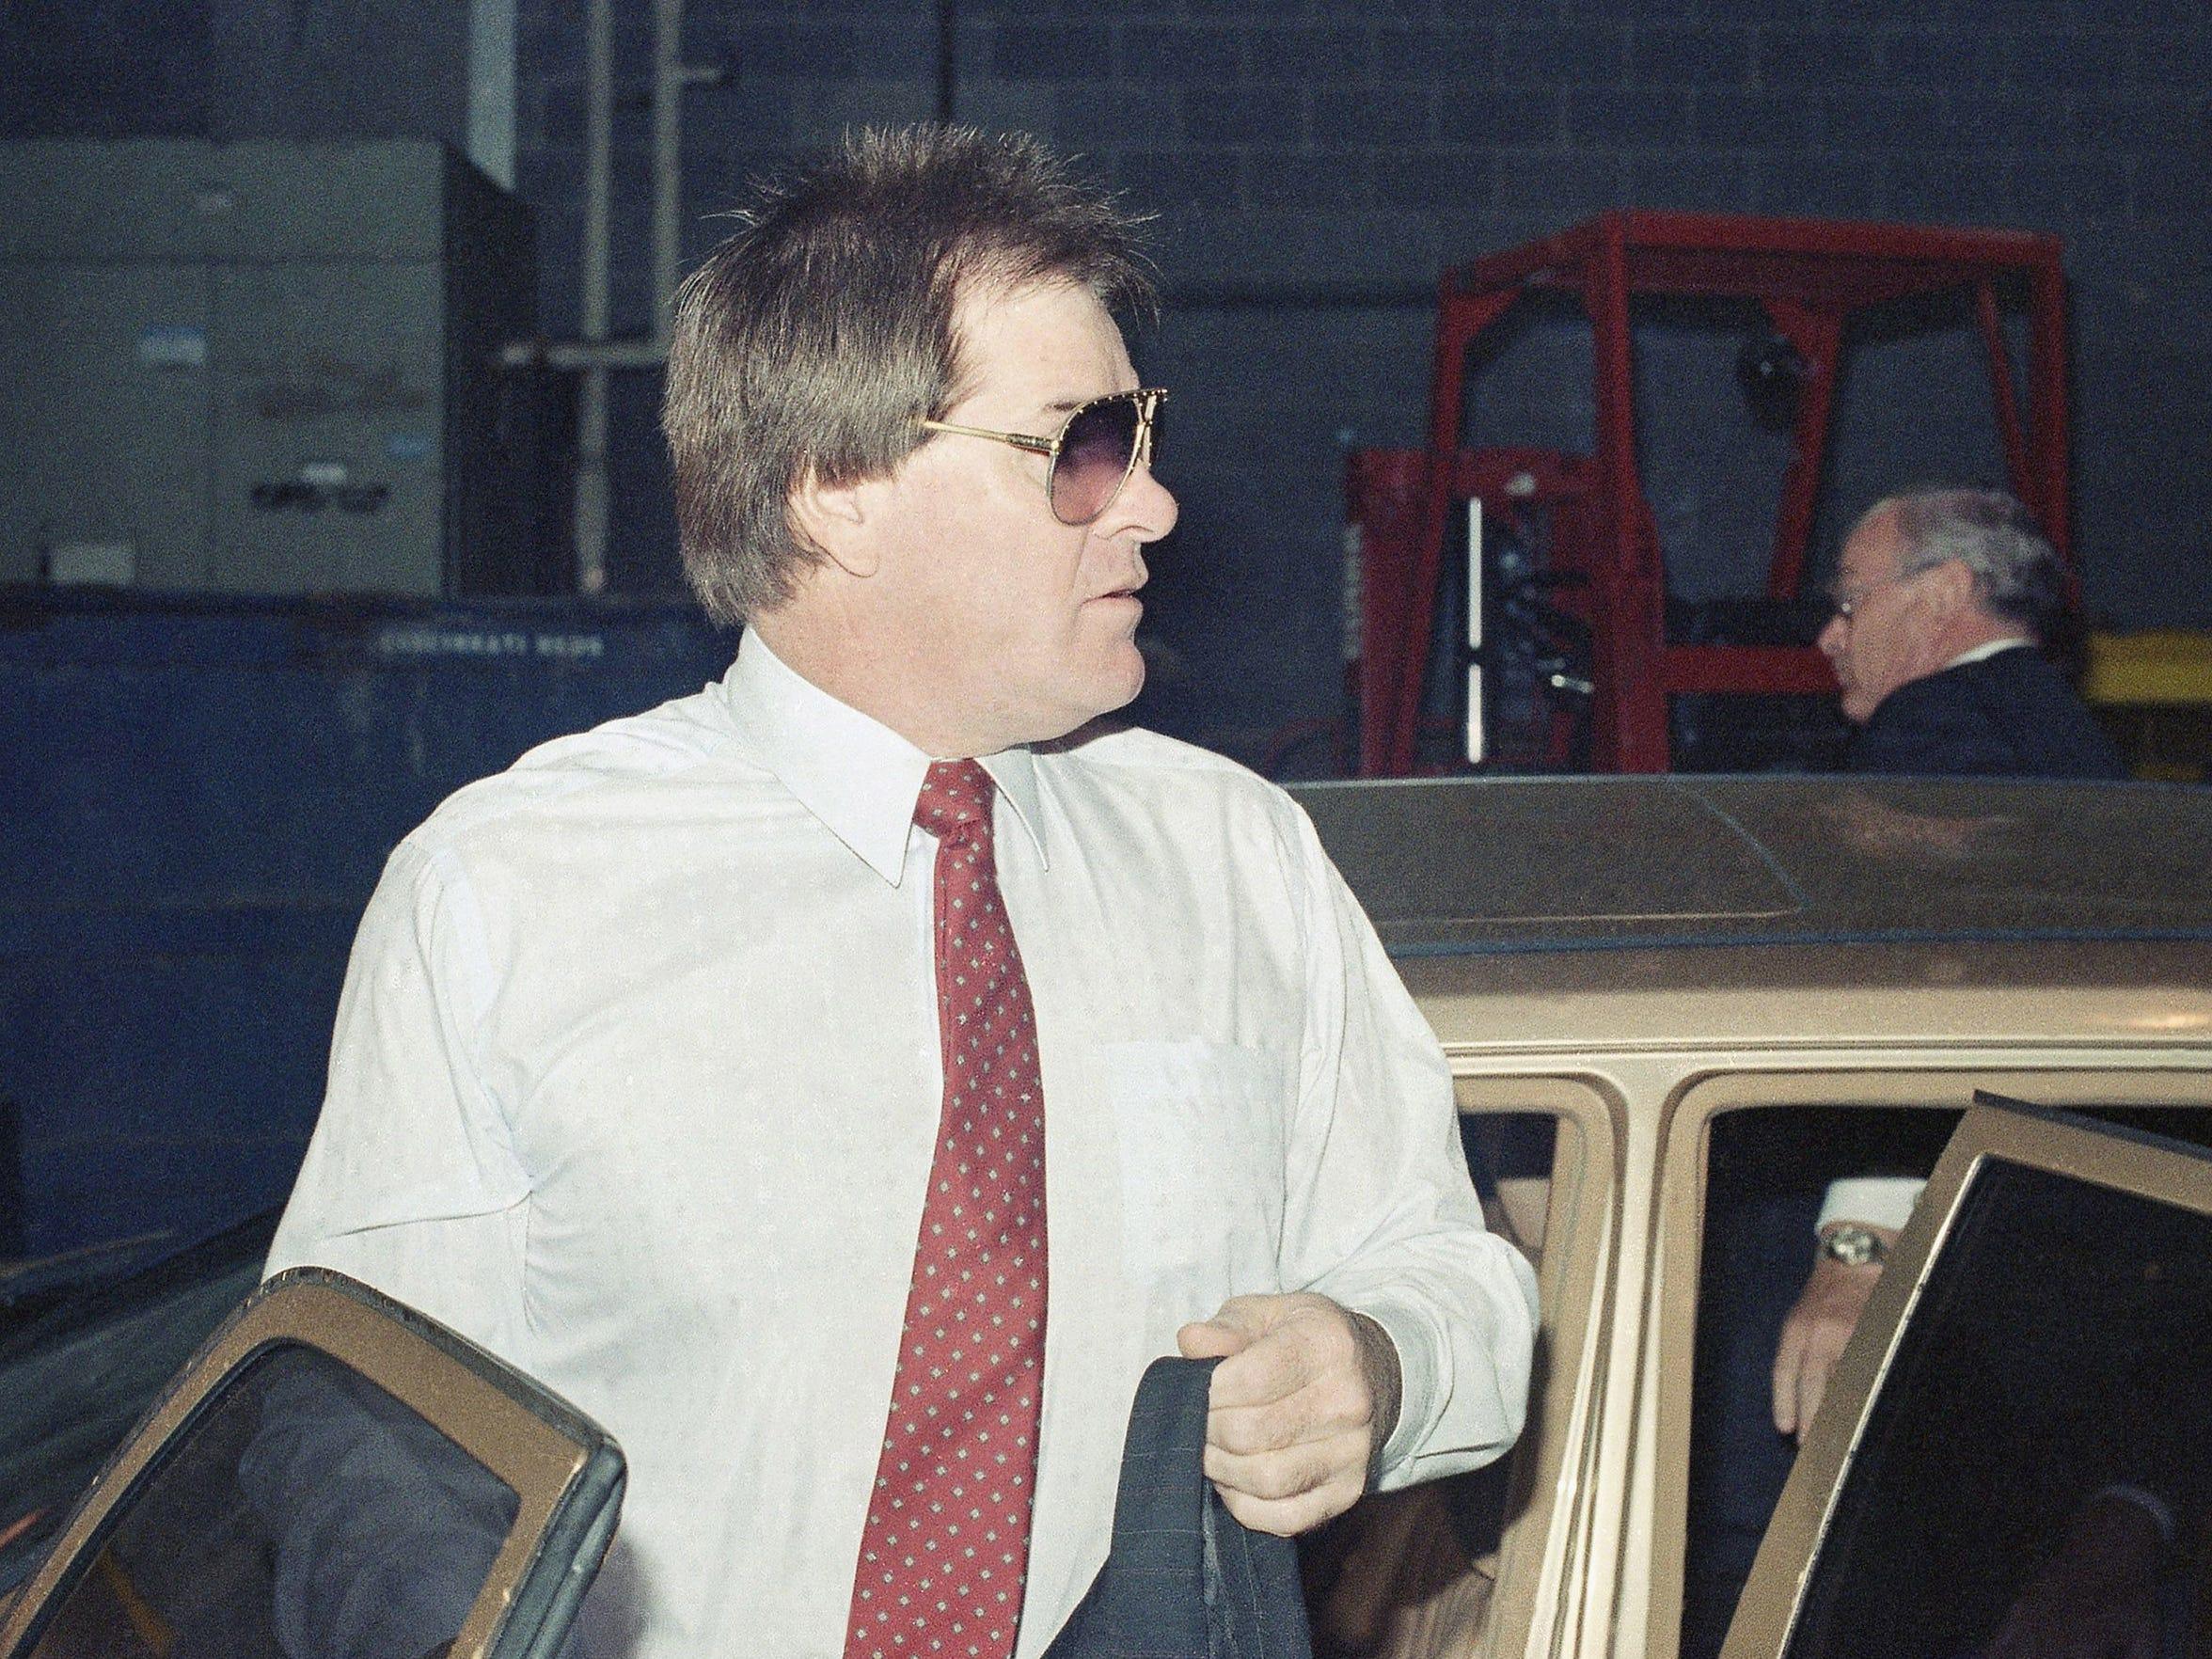 Cincinnati Reds Manager Pete Rose enters Riverfront